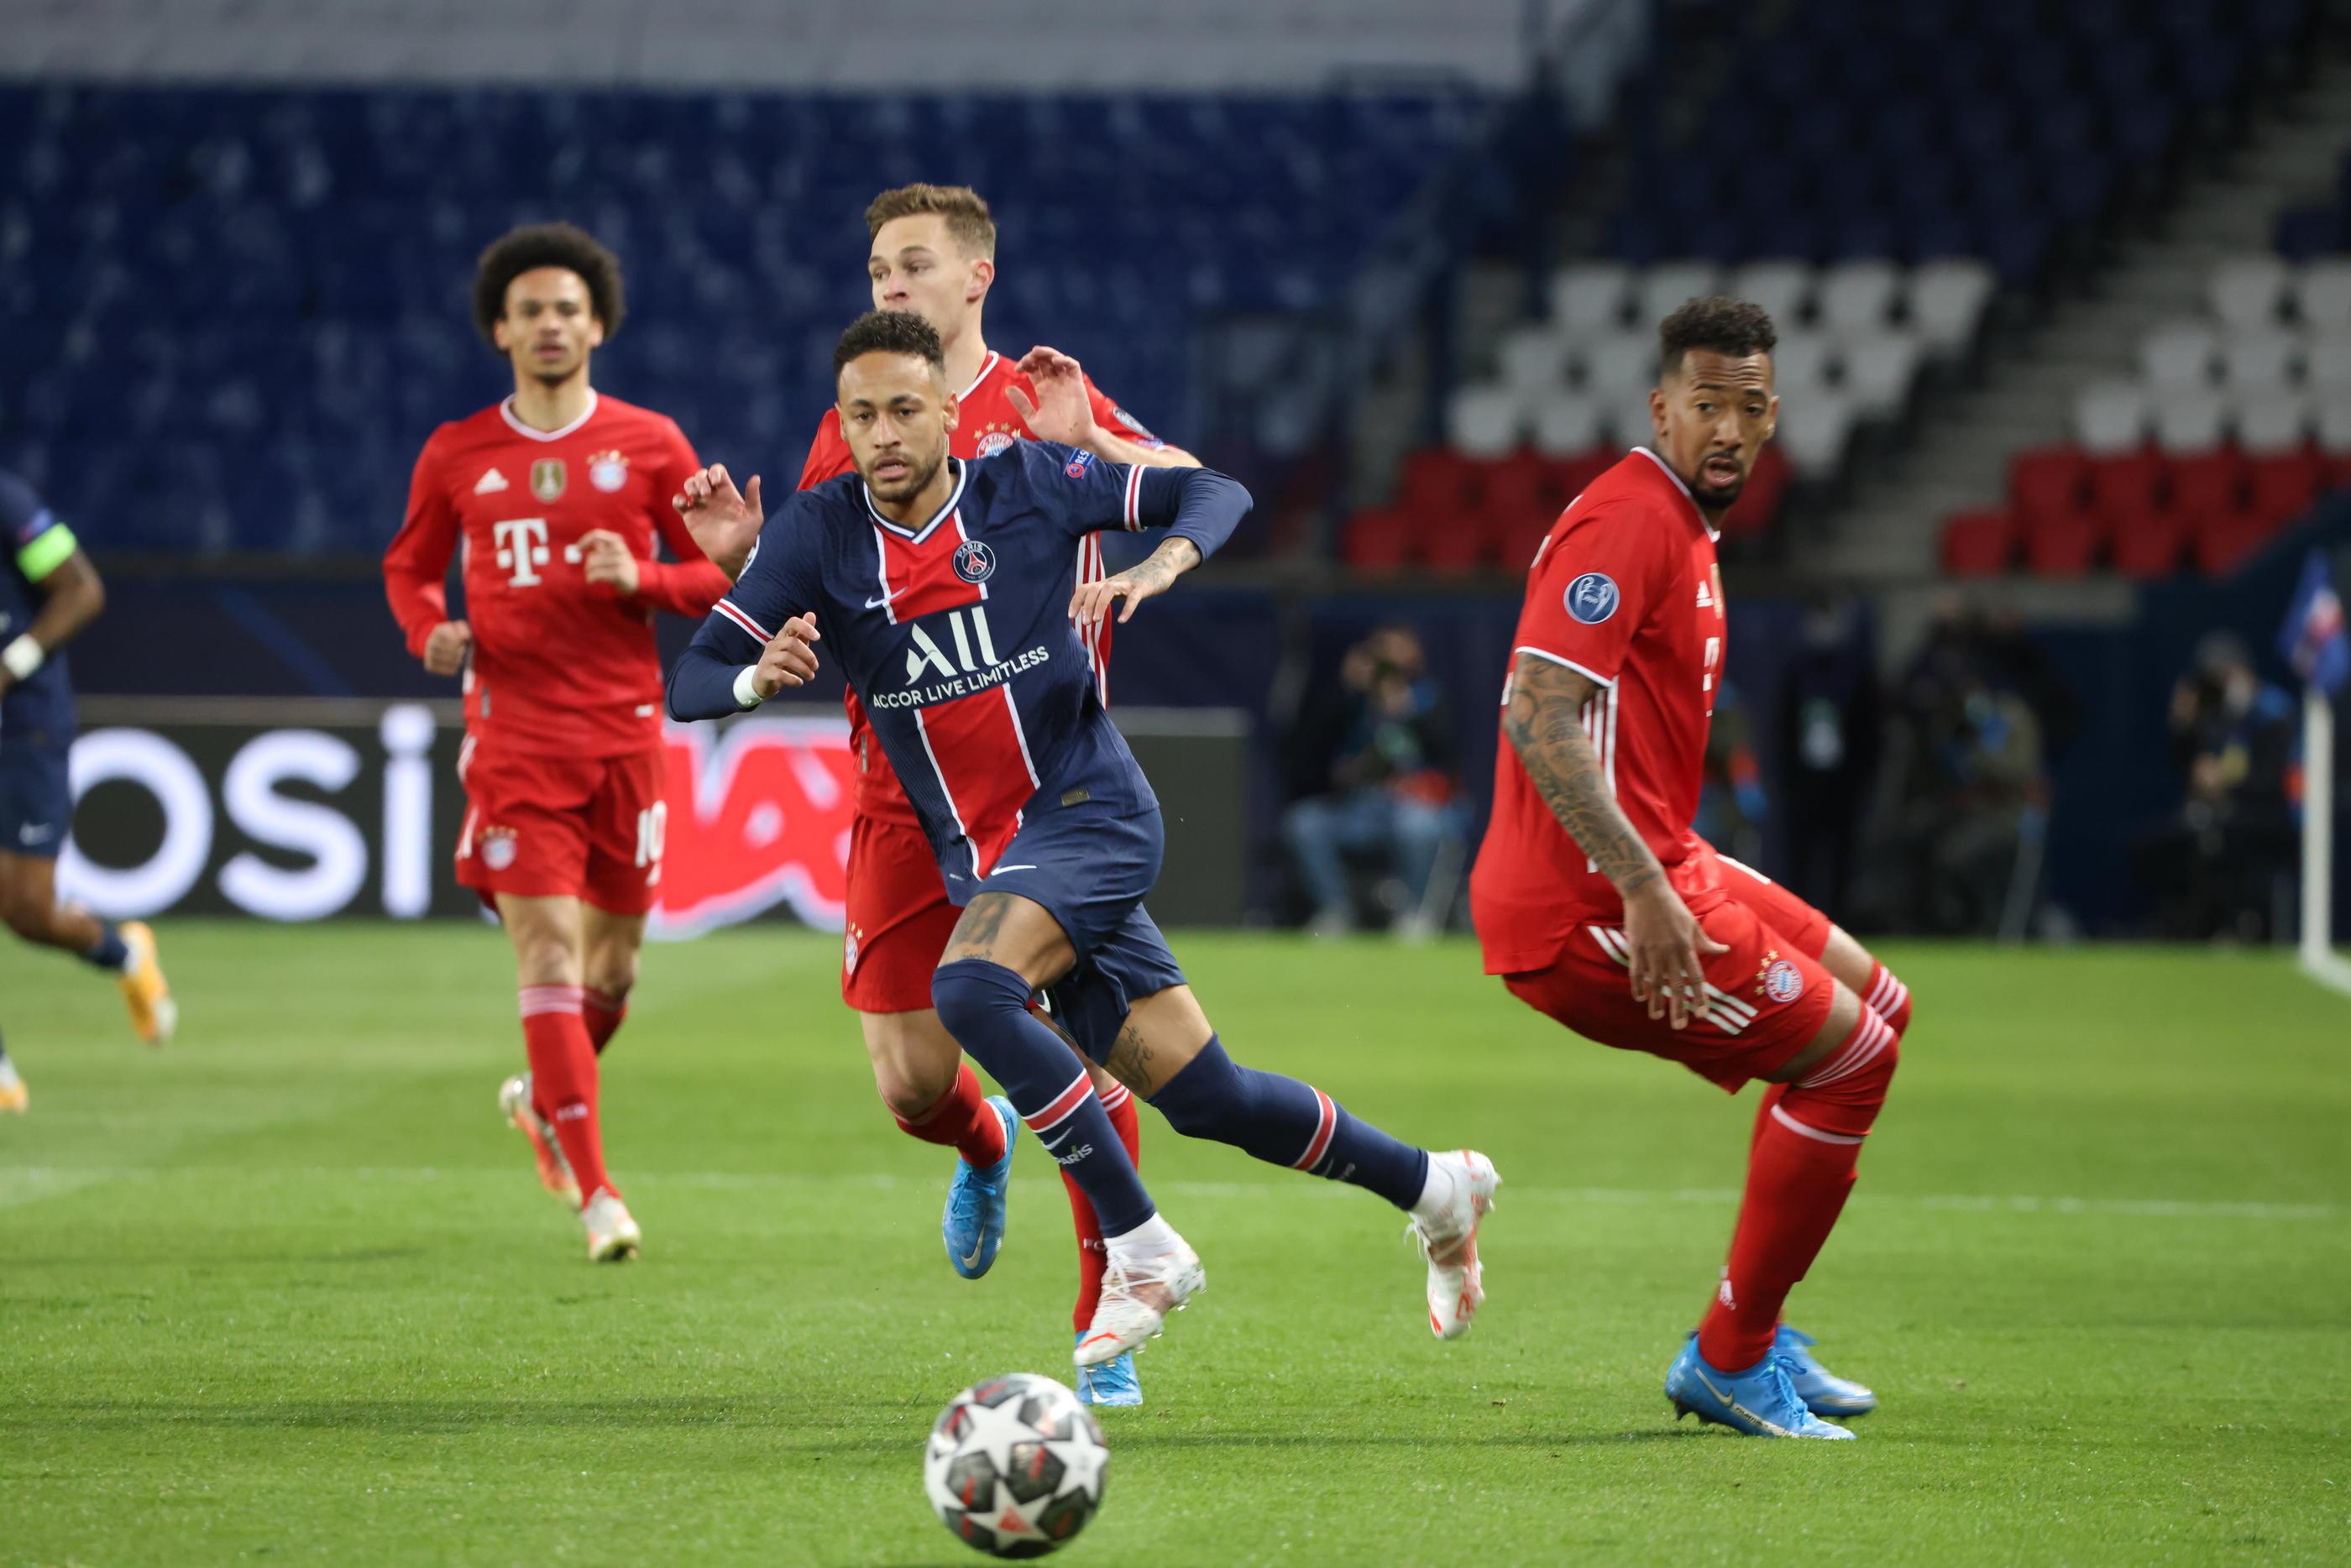 PSG – Bayern (0-1) : Neymar, brillant mais frustrant